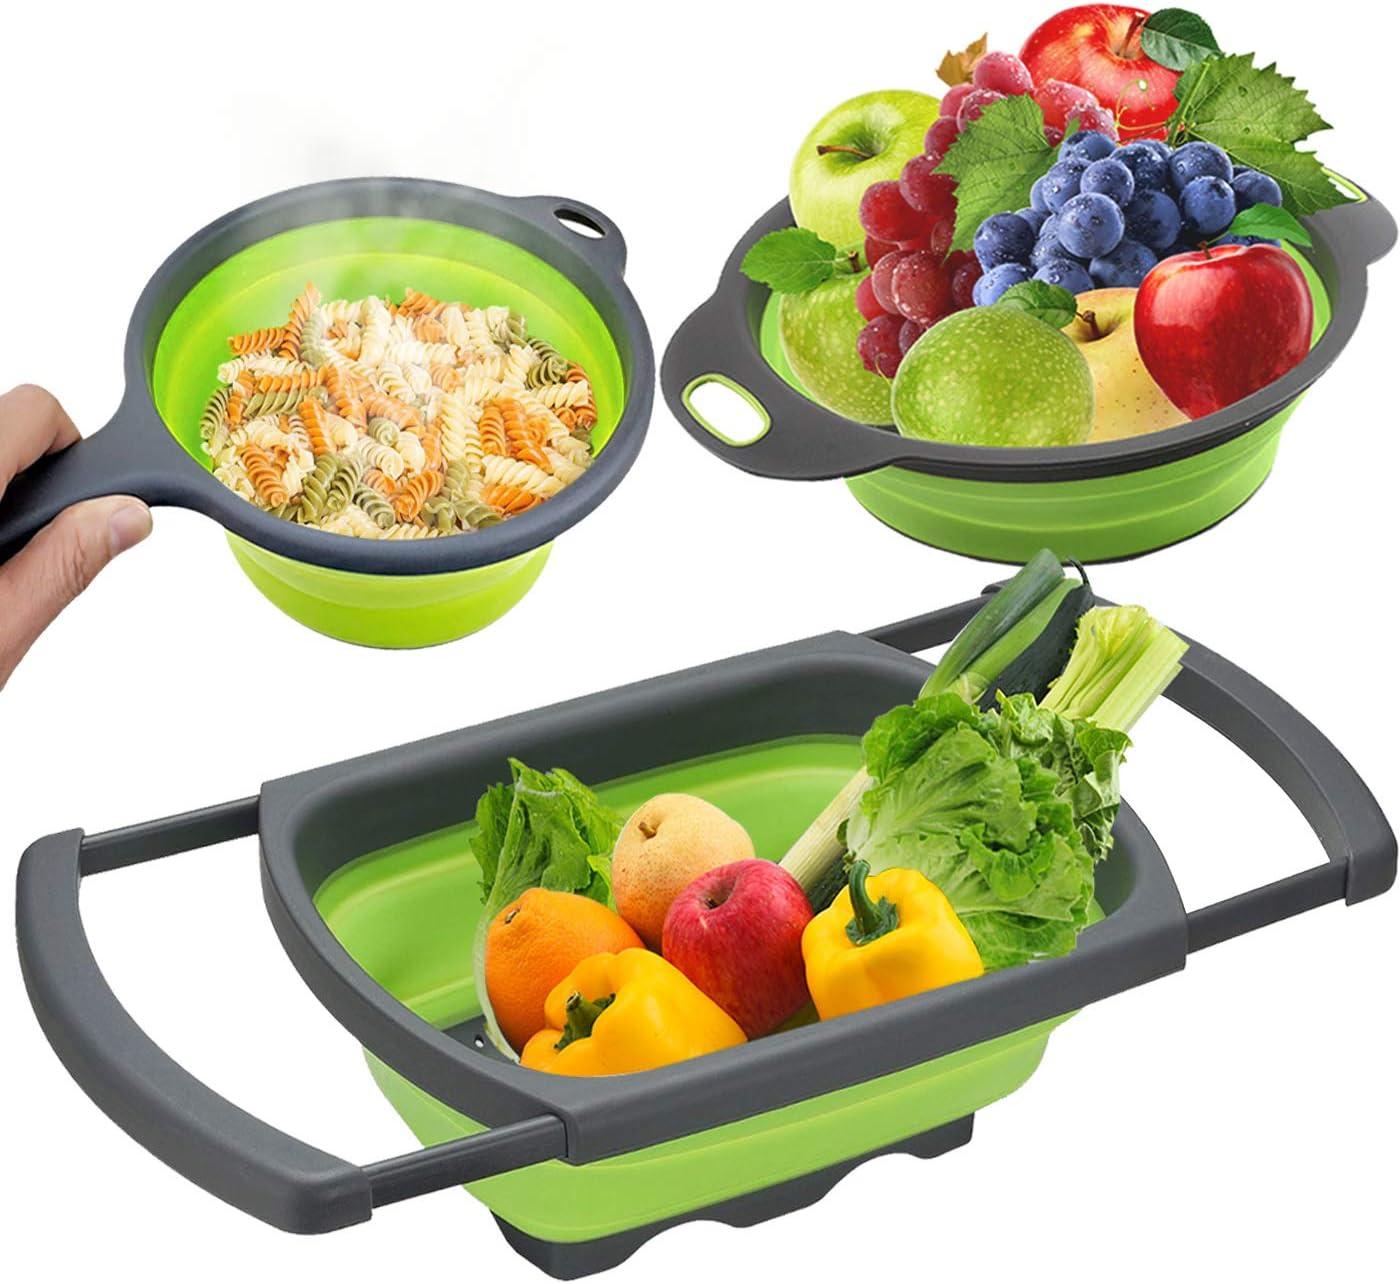 LTSGORY Silicone Colander, Collapsible Kitchen Food Grade Colander Set - 6 Quart Over The Sink Collander + 4-Quart Veggies/Fruit Basket and Colanders + 2-Quart Pasta Strainer With Handle 3-Packs